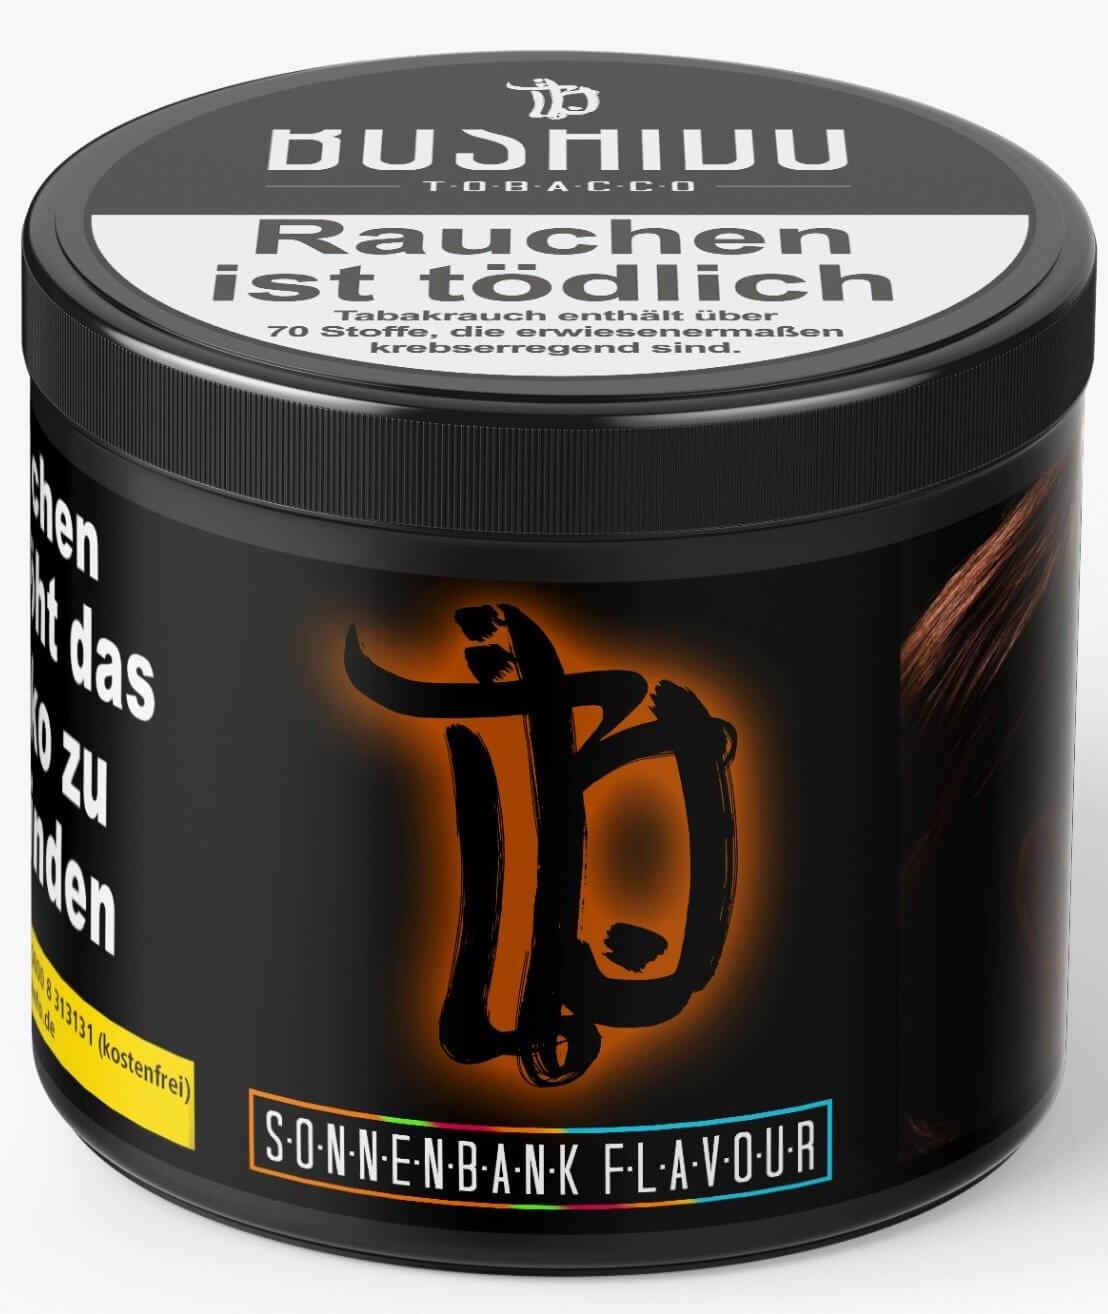 Bushido Tabak 200g Sonnenbank Flavour